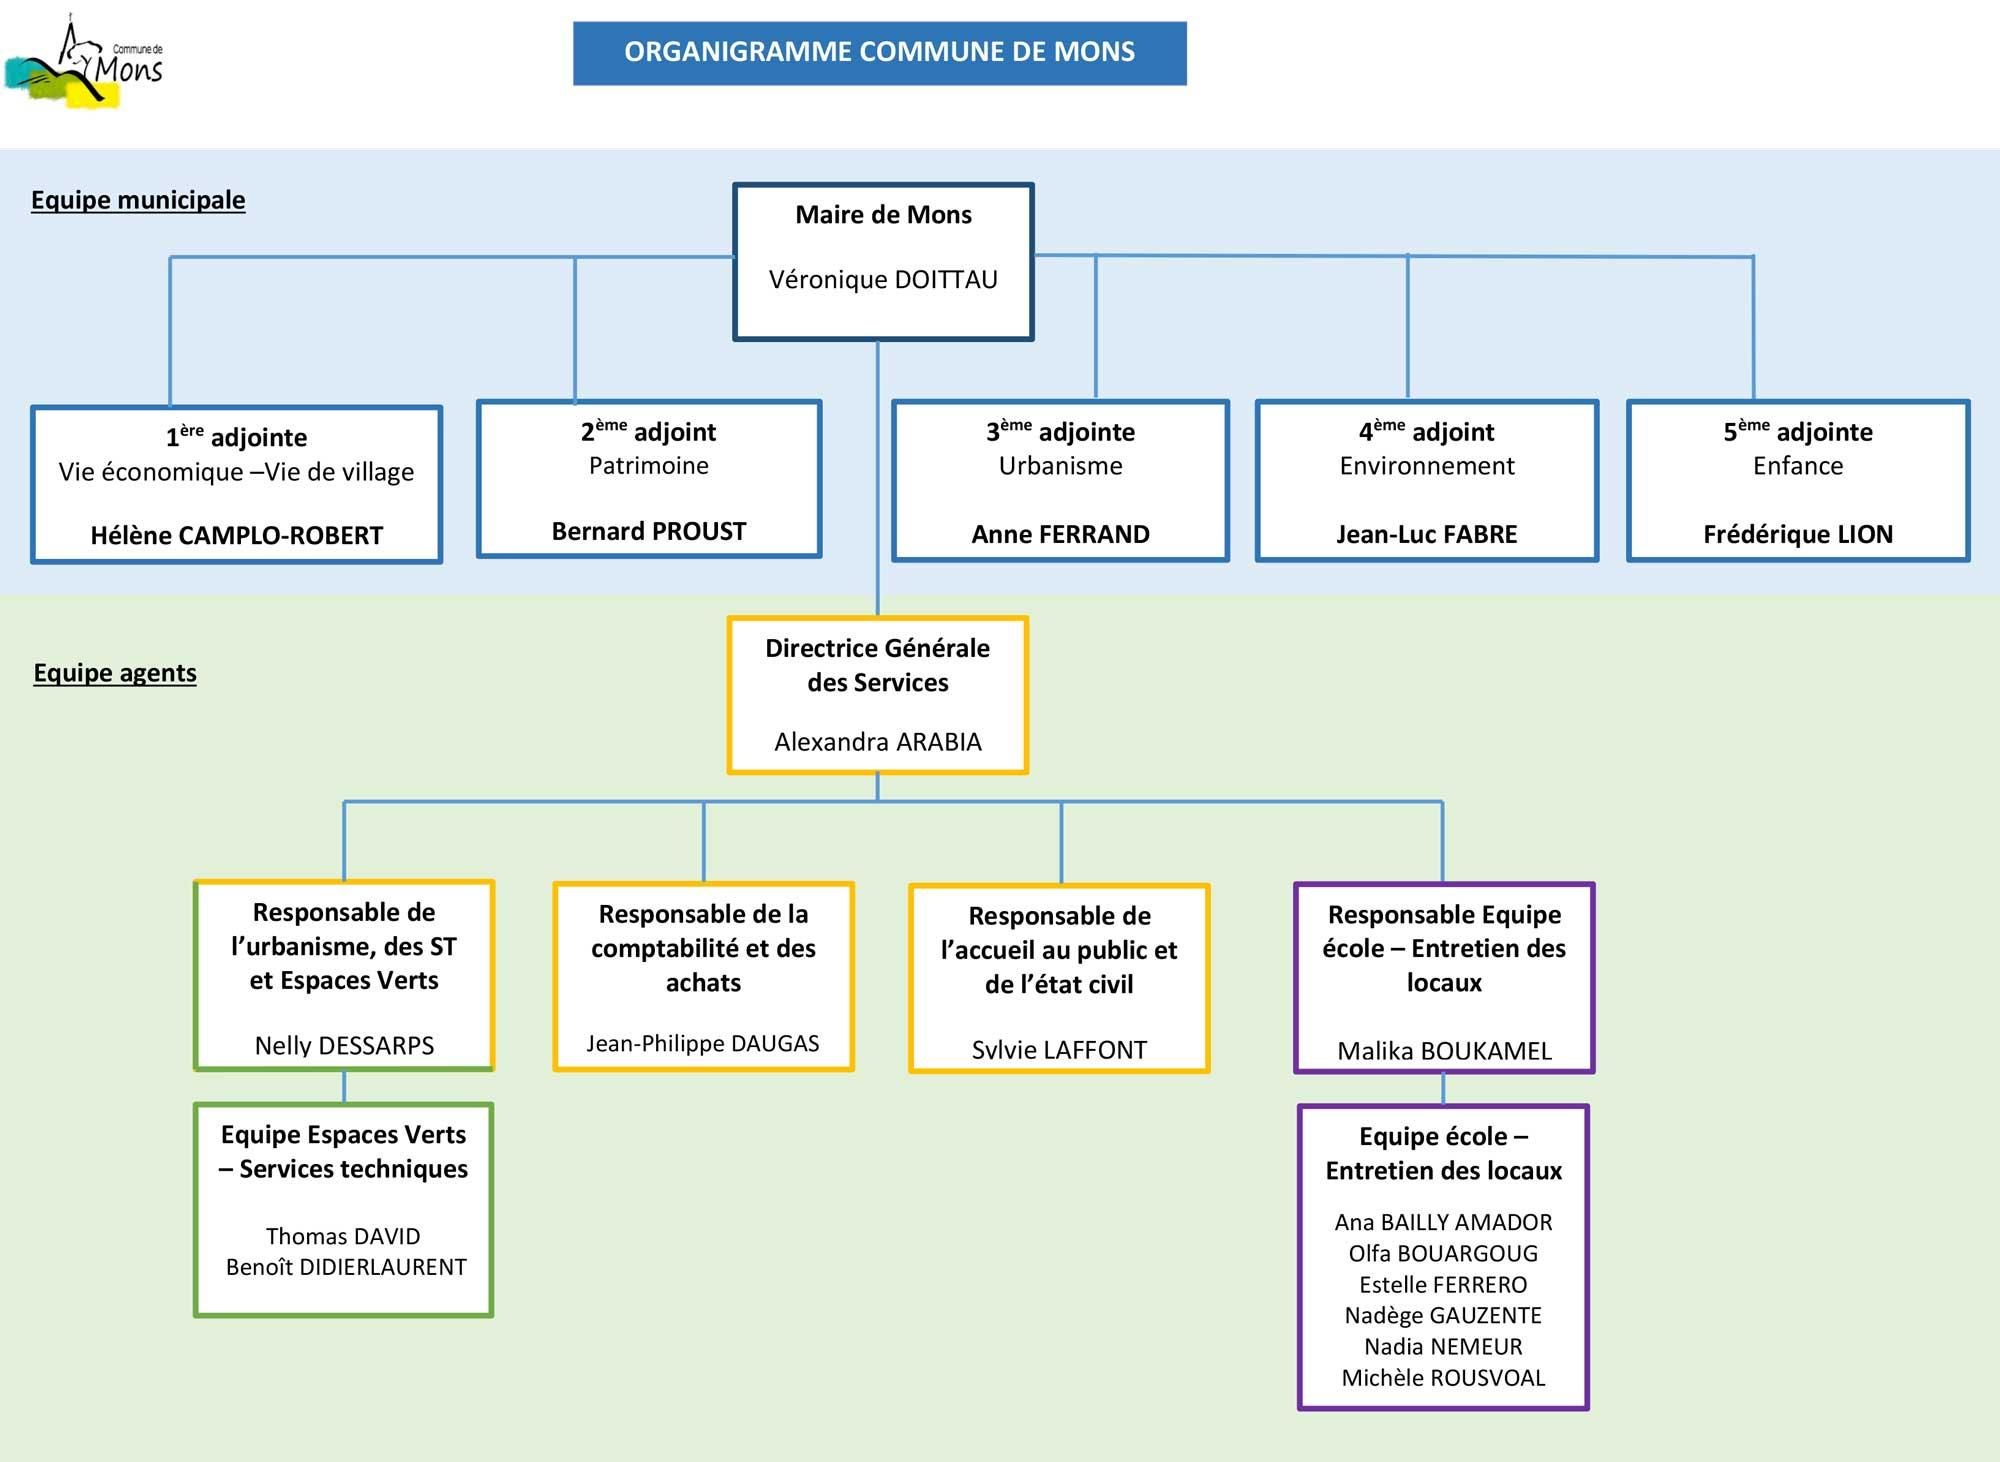 Organigramme commune de Mons